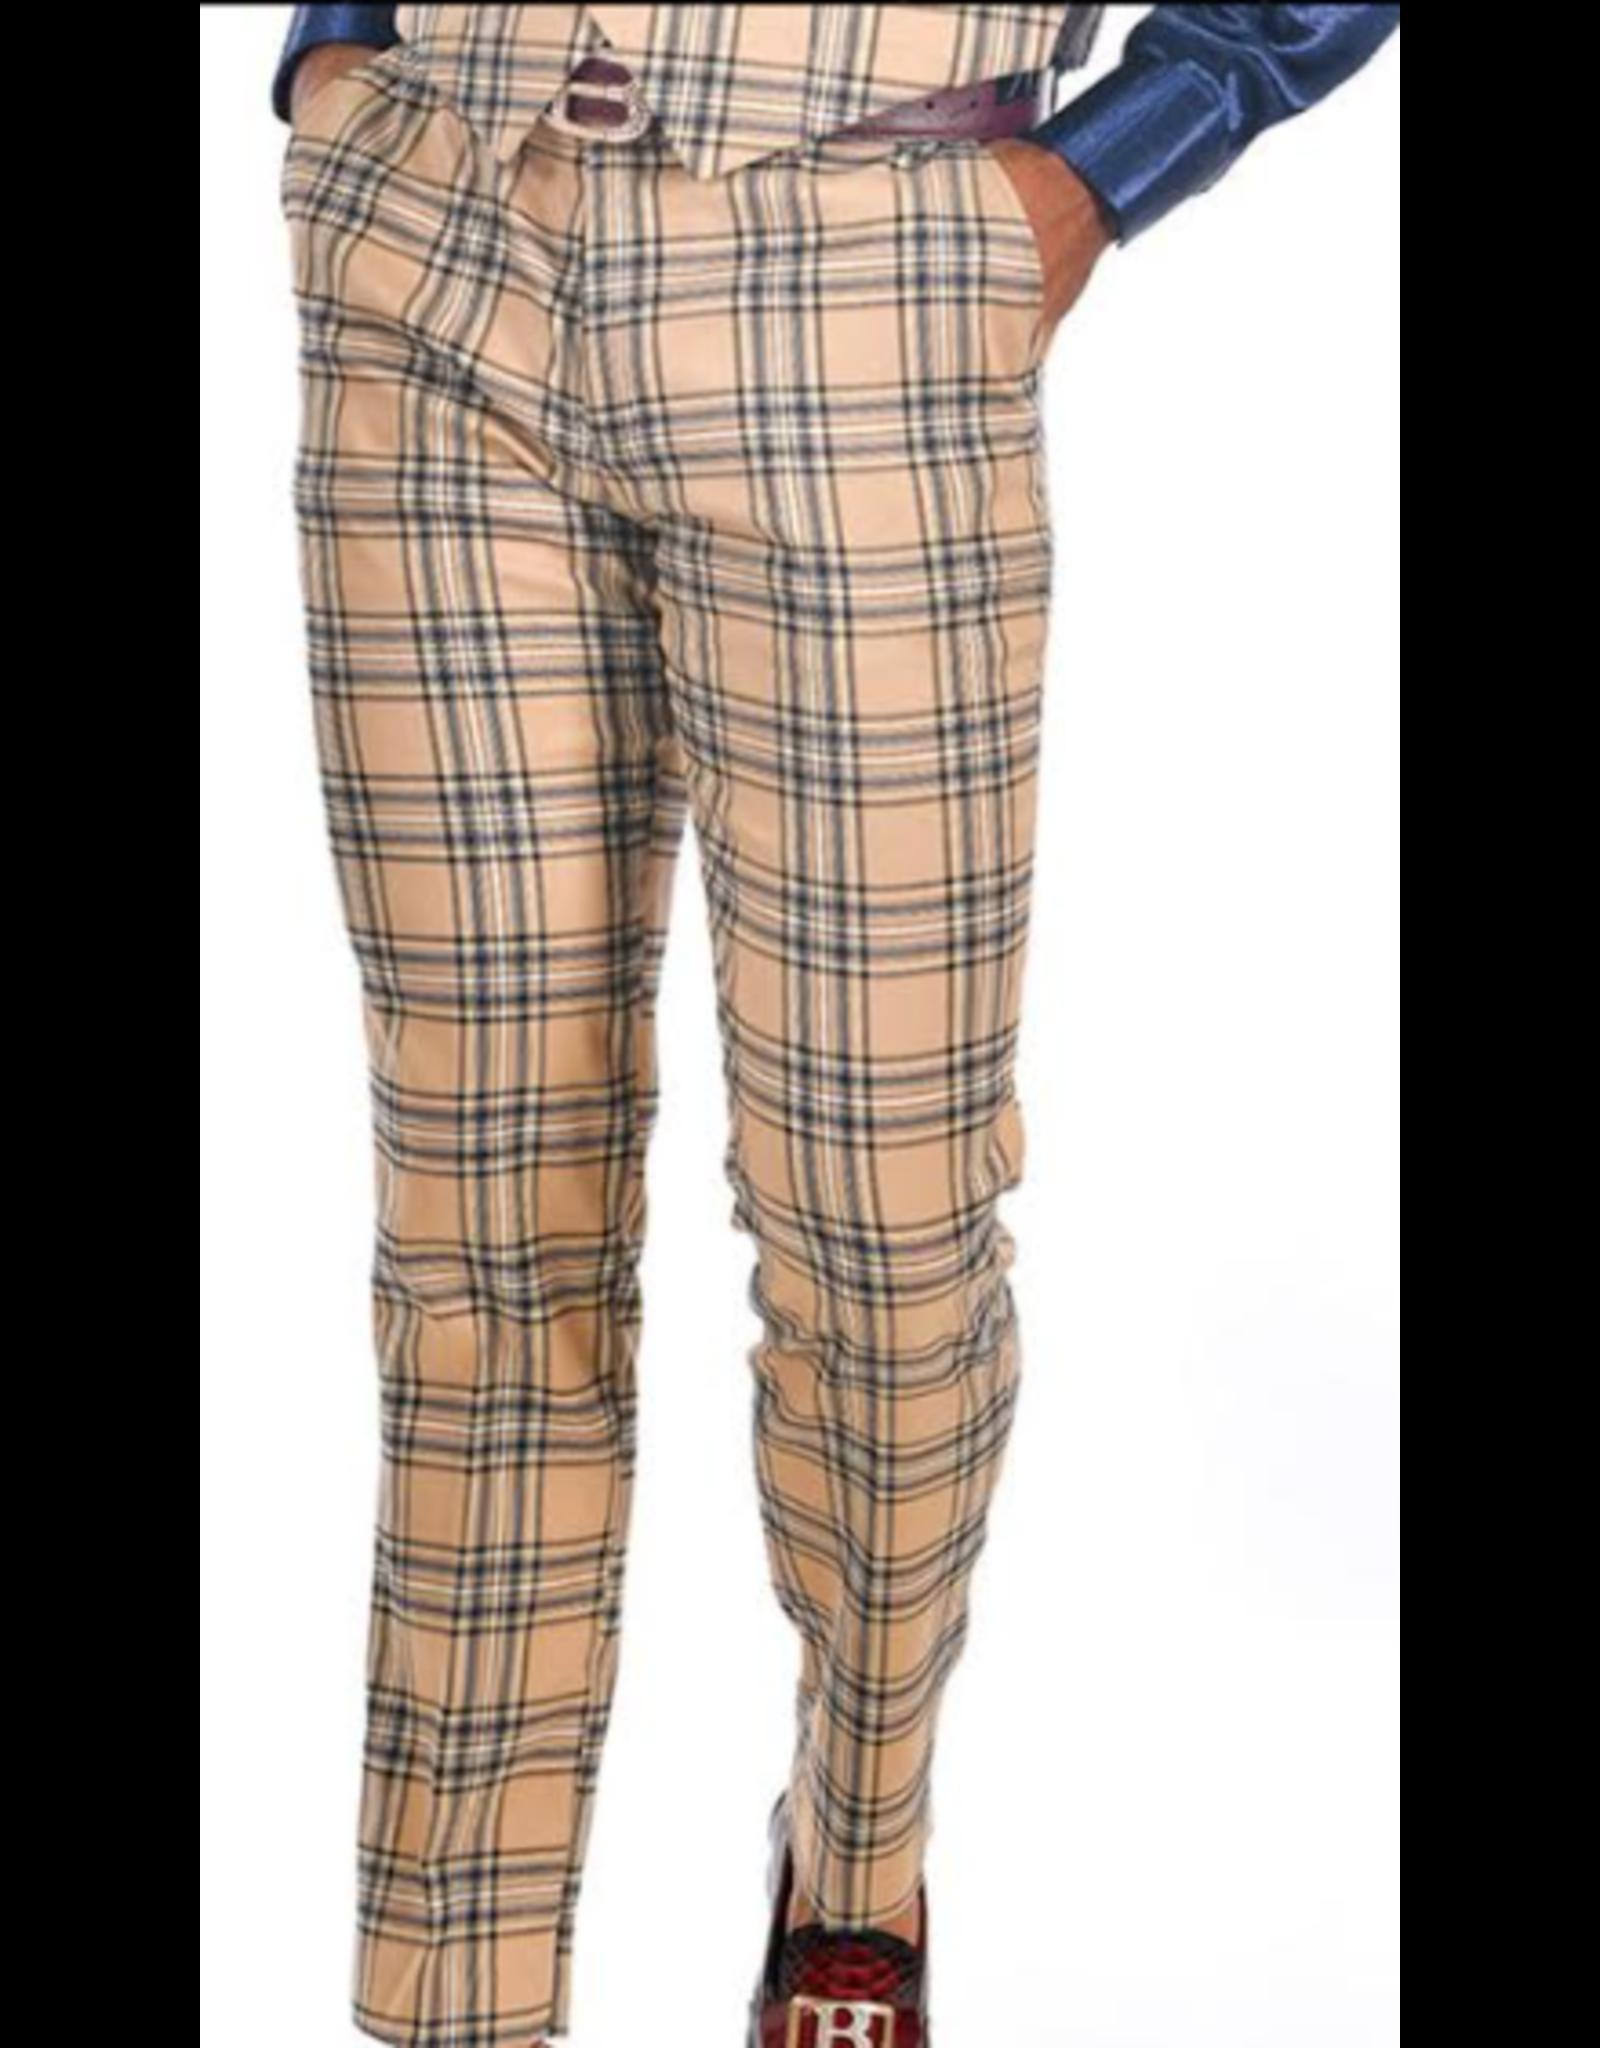 Barabas Barabas Slim Fit Pant - CP60 Cream/Black Plaid